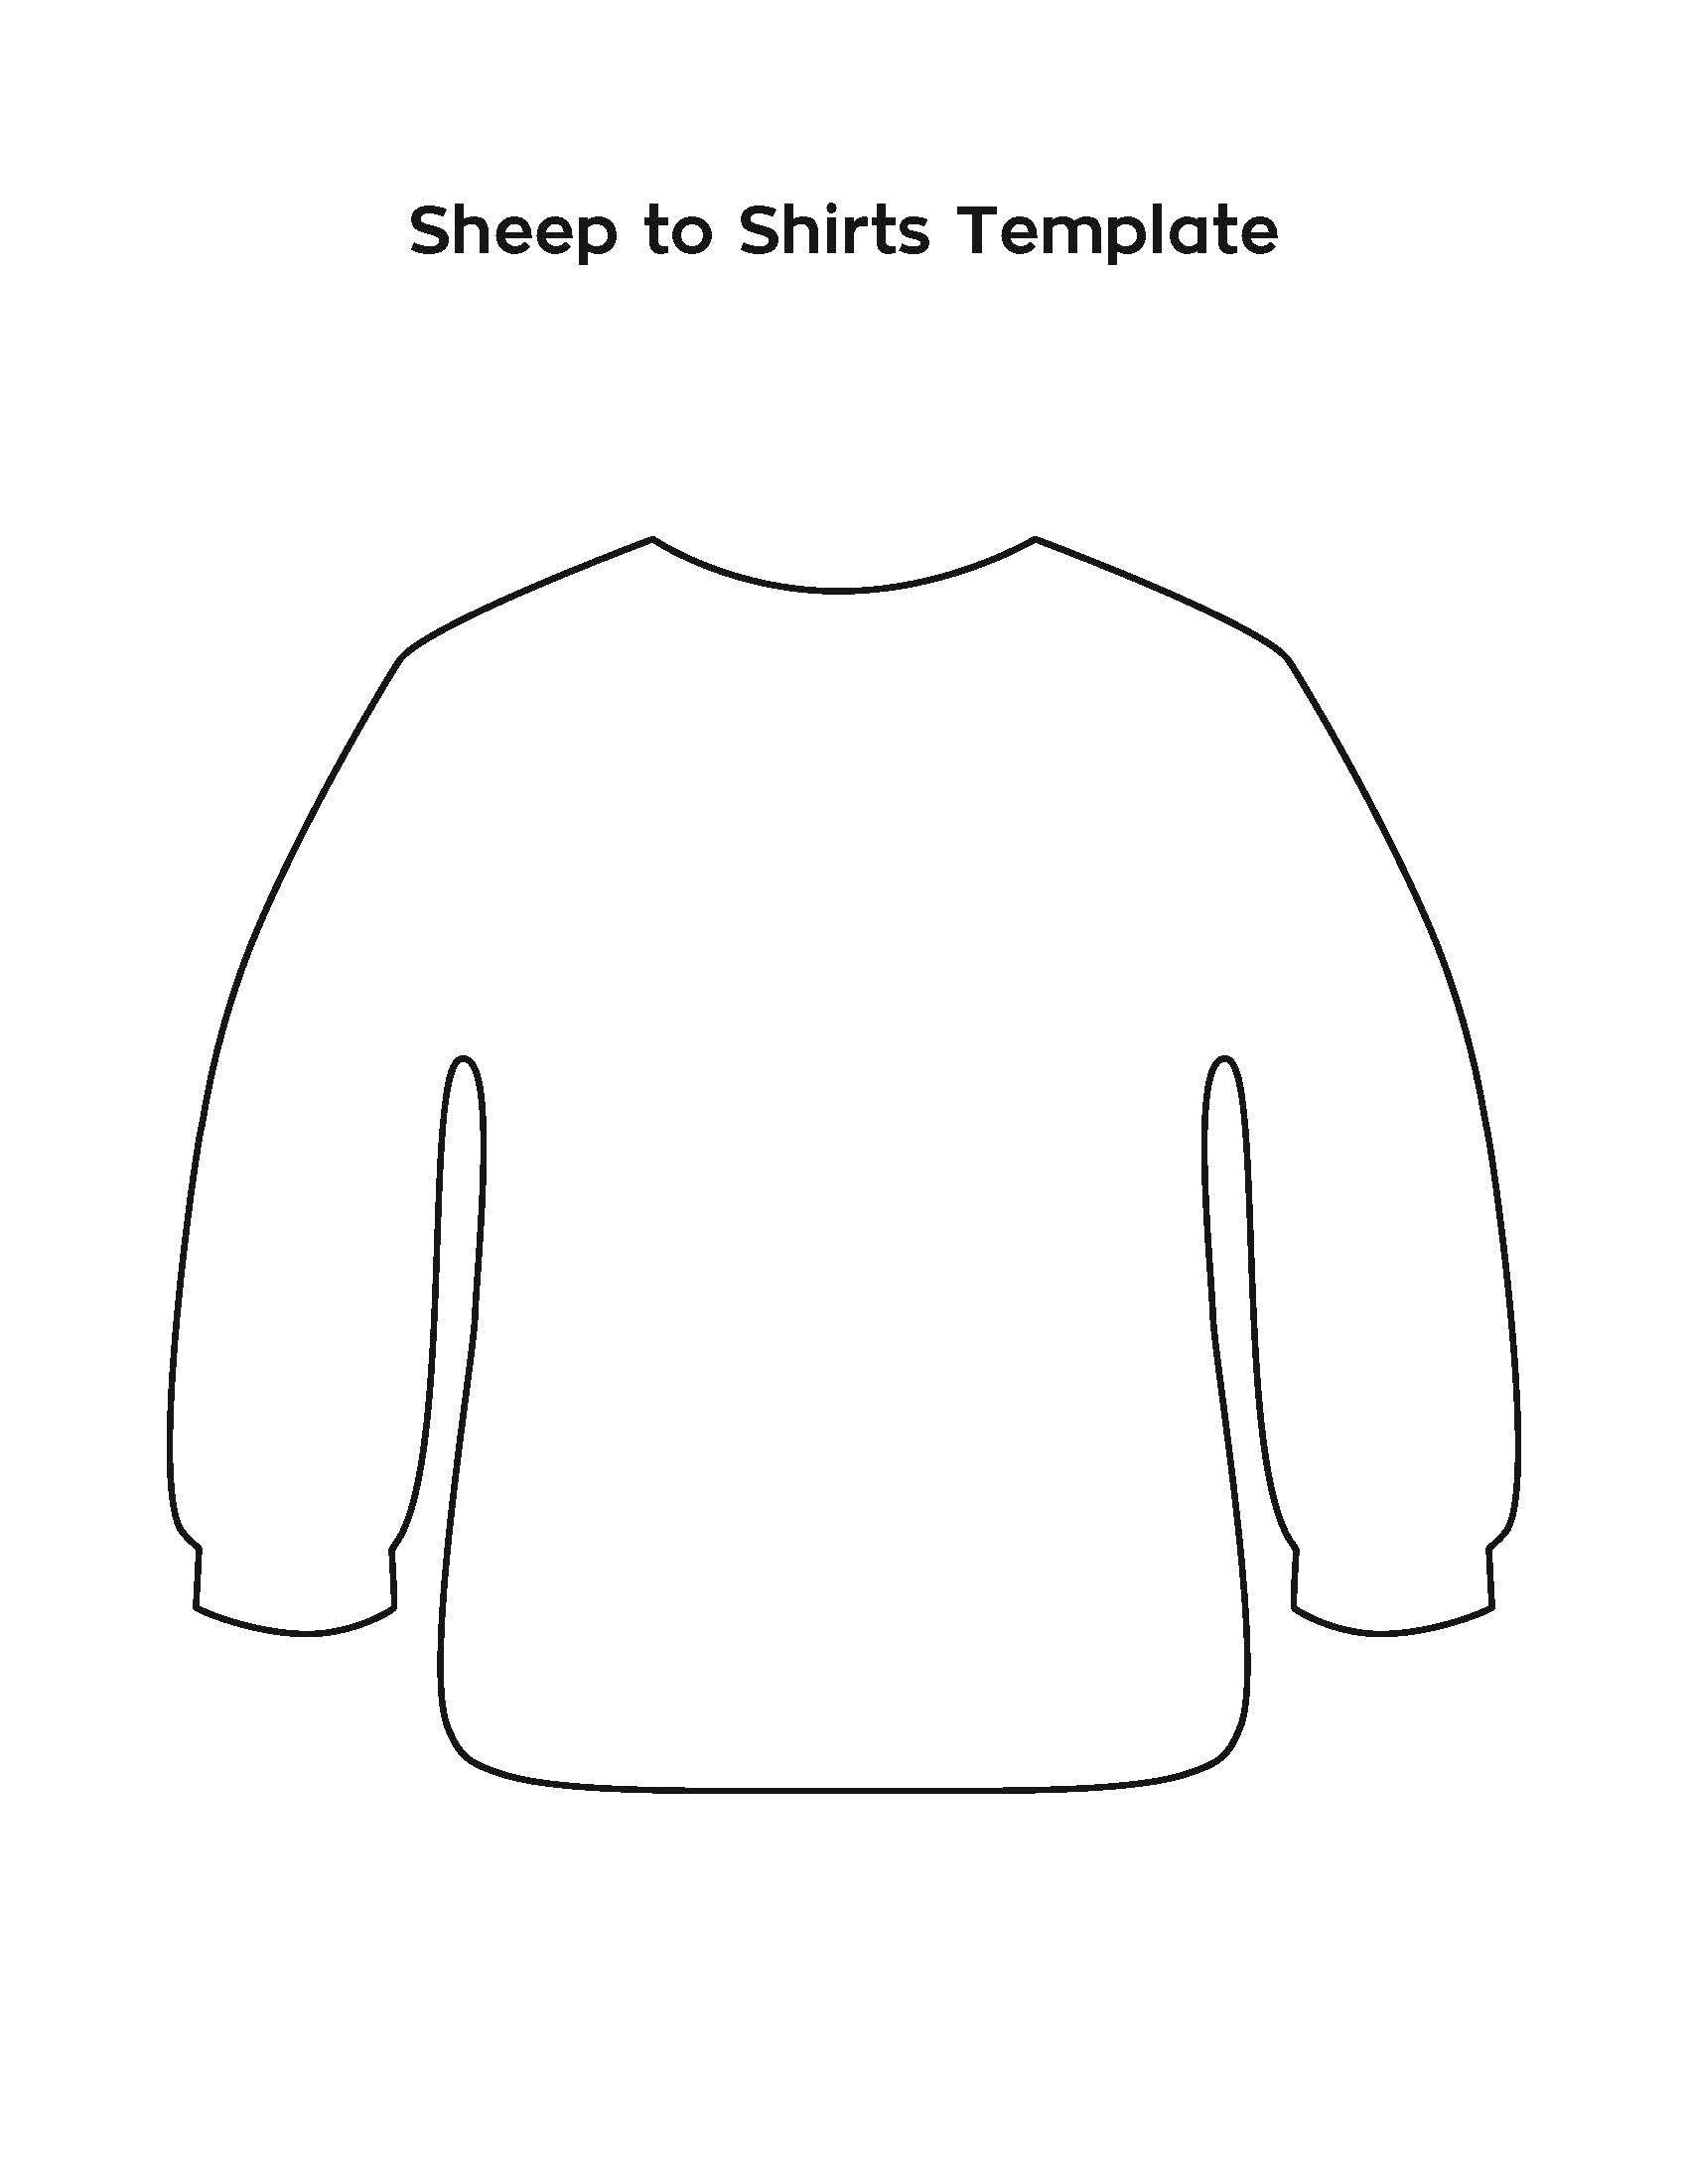 Sheep To Shirts Template